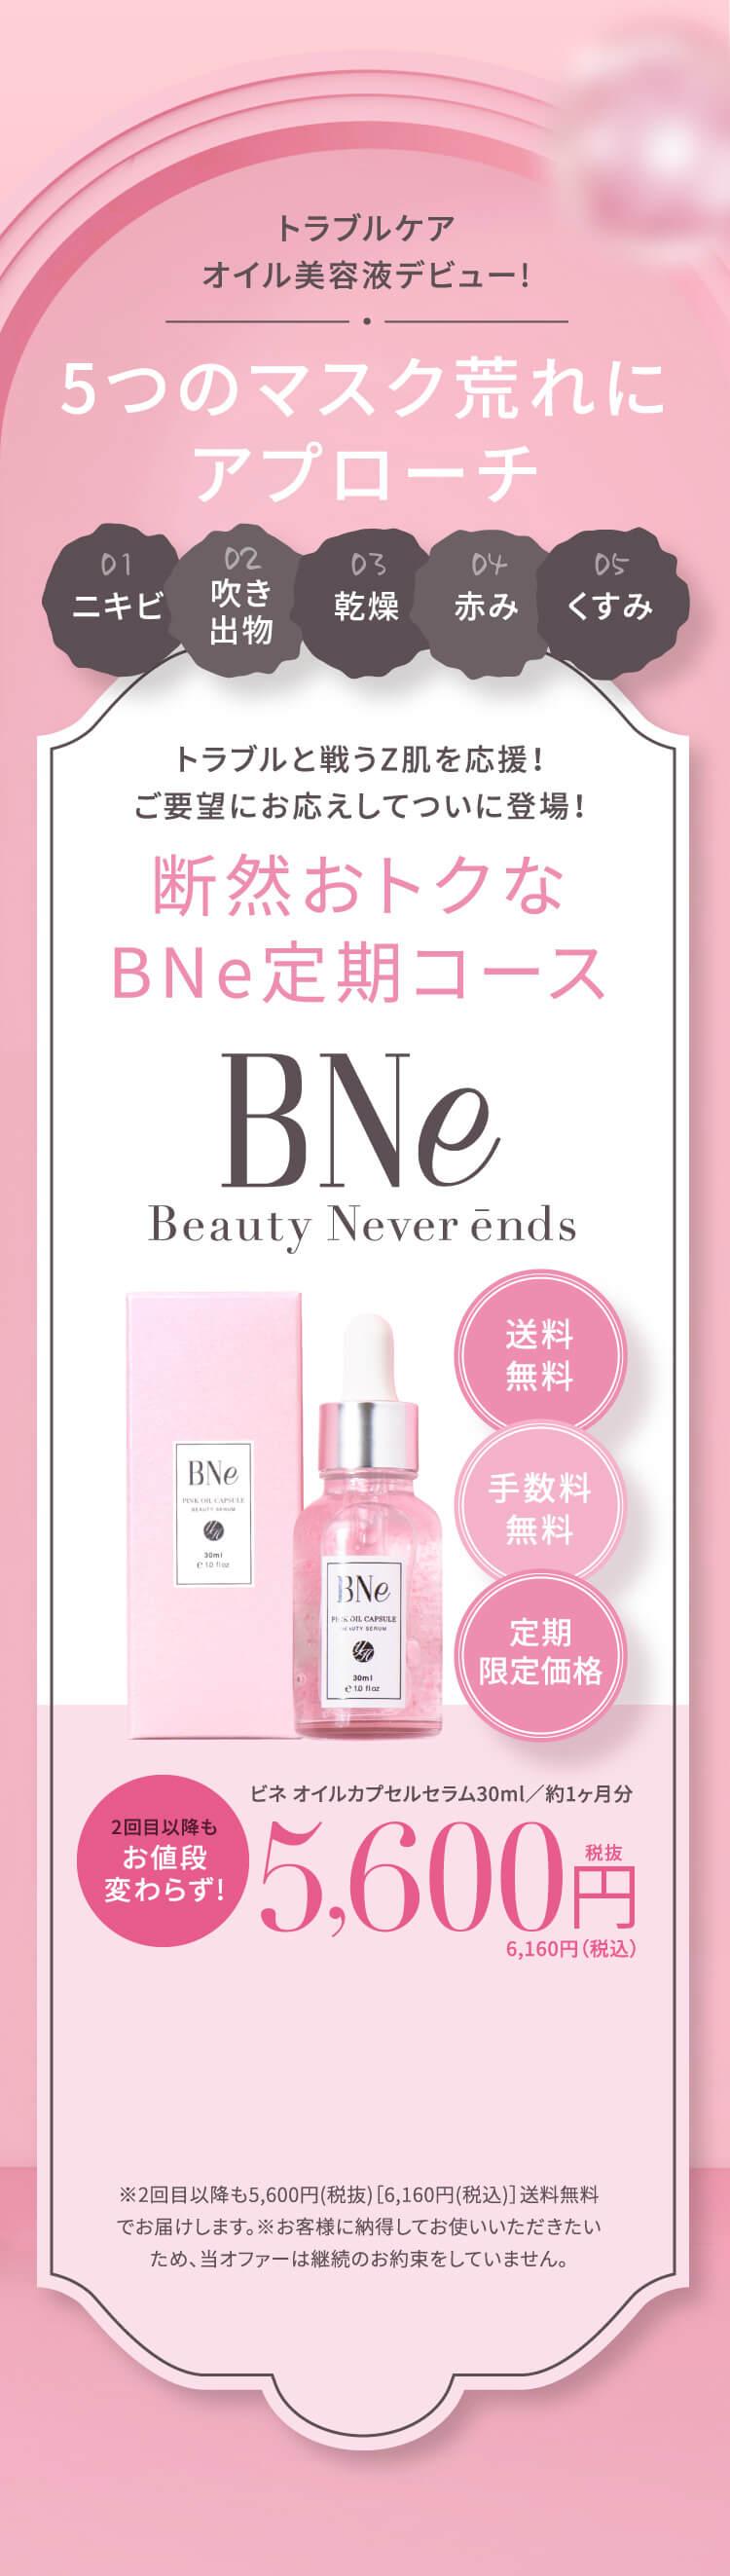 BNeお得な定期コース。5,600円(税抜)